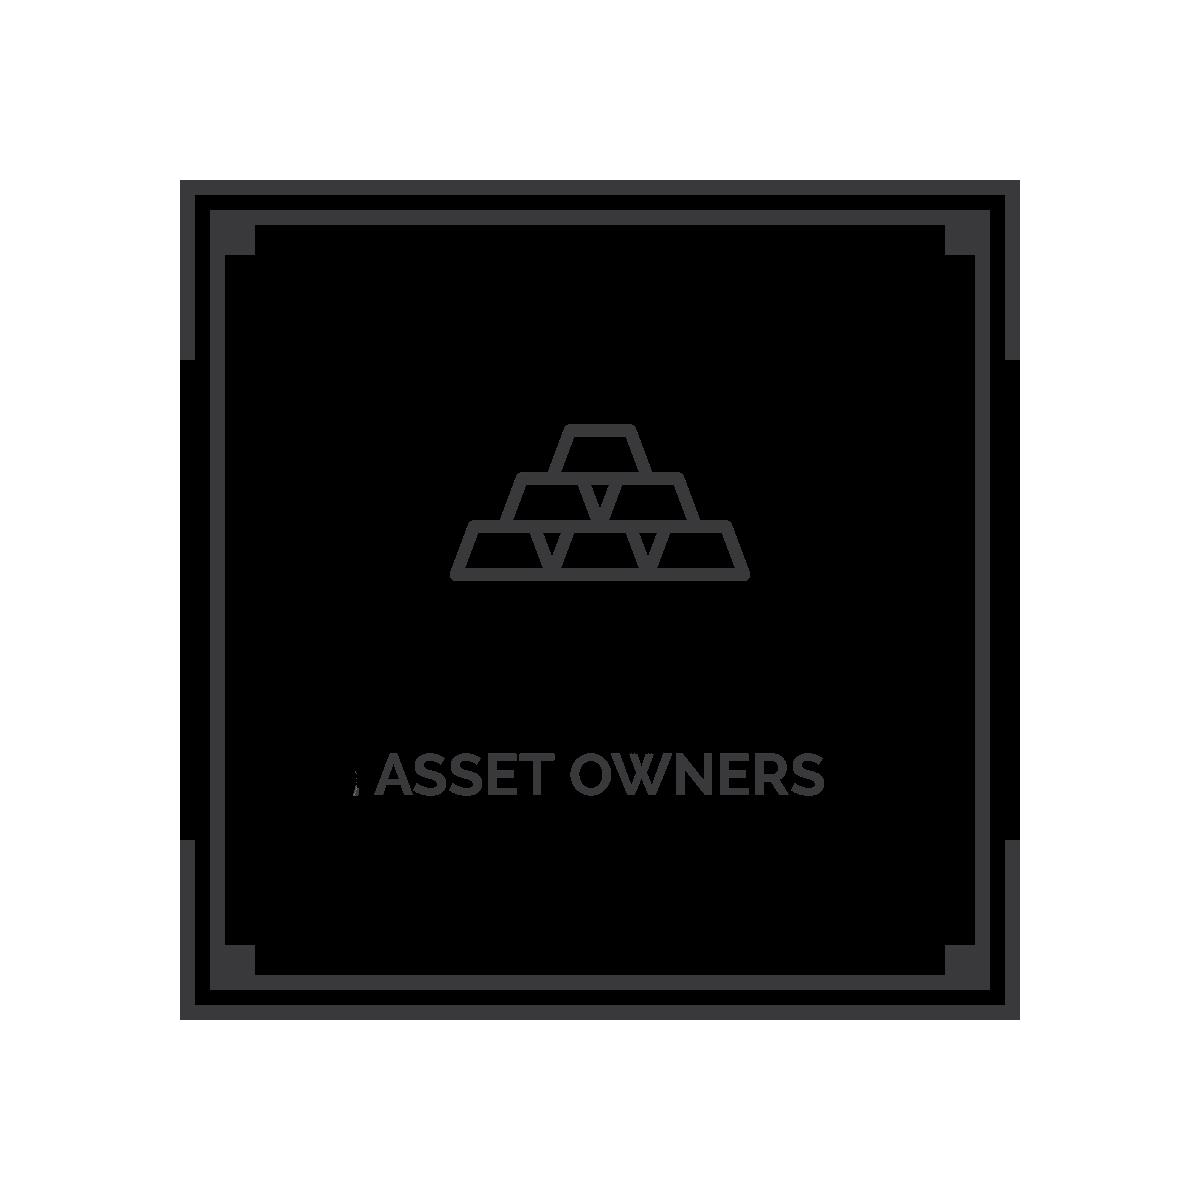 logo_transparent_color.png